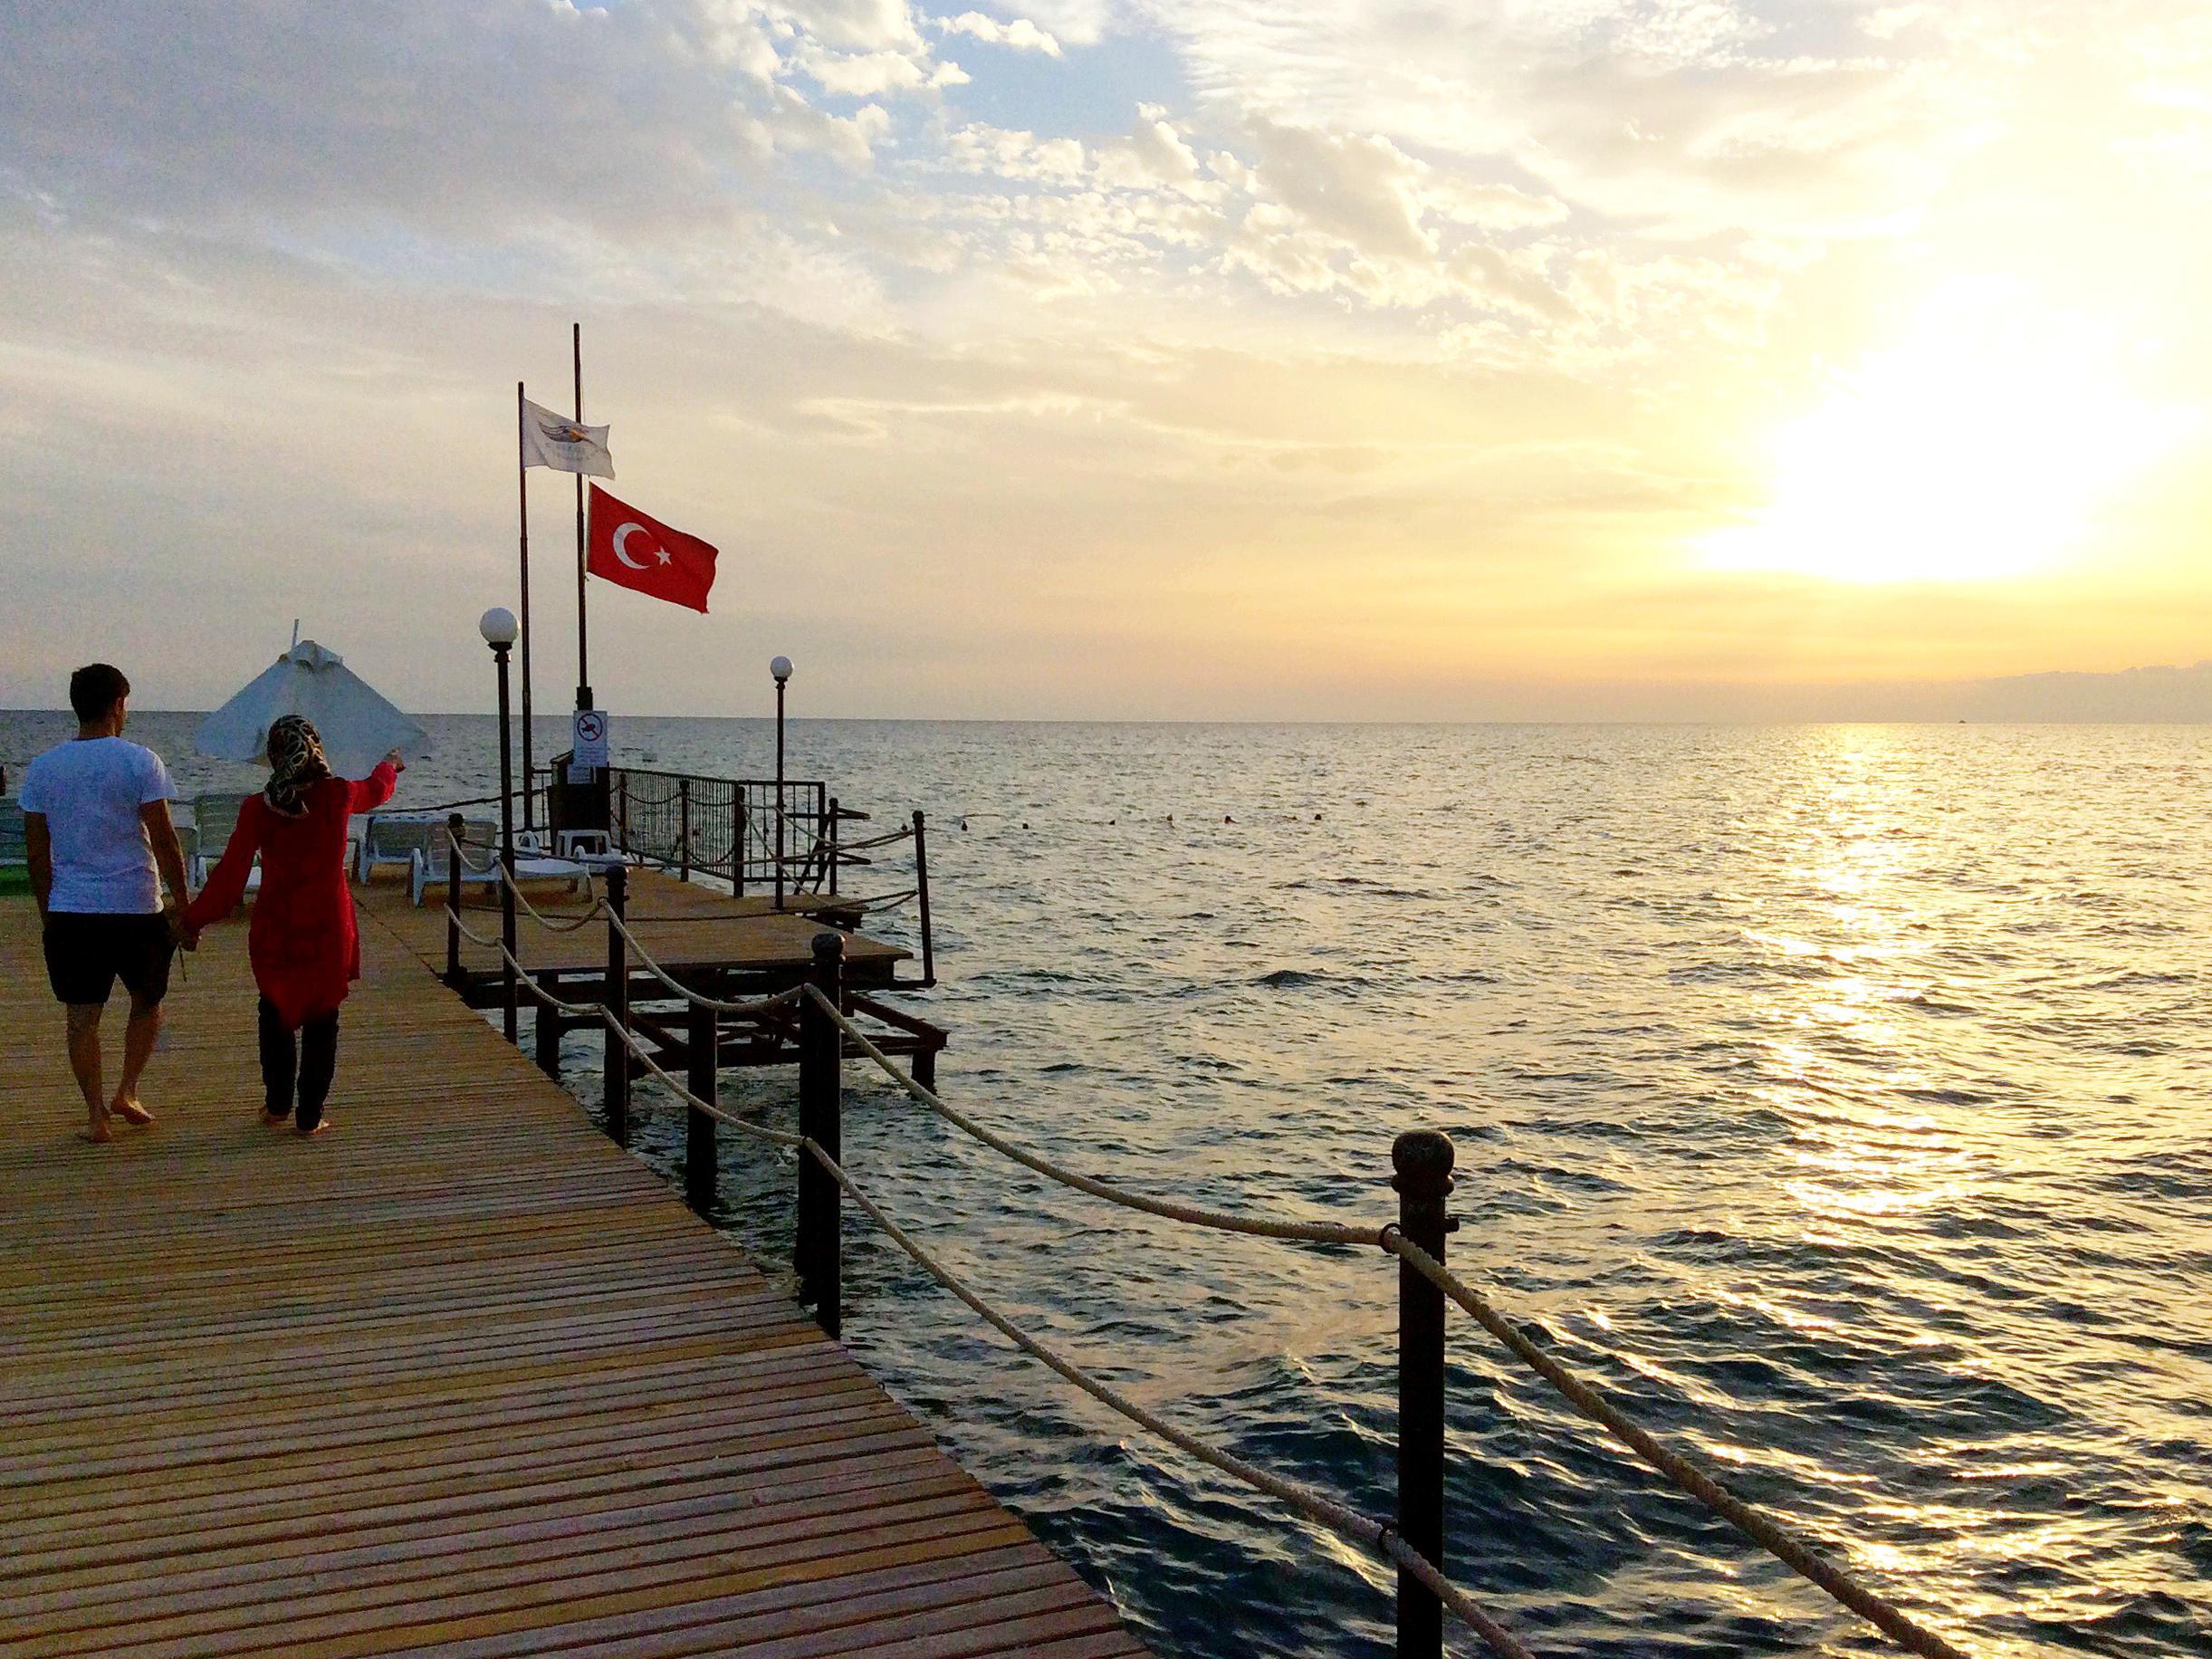 Halal holidays: what it's like to take a Muslim beach break